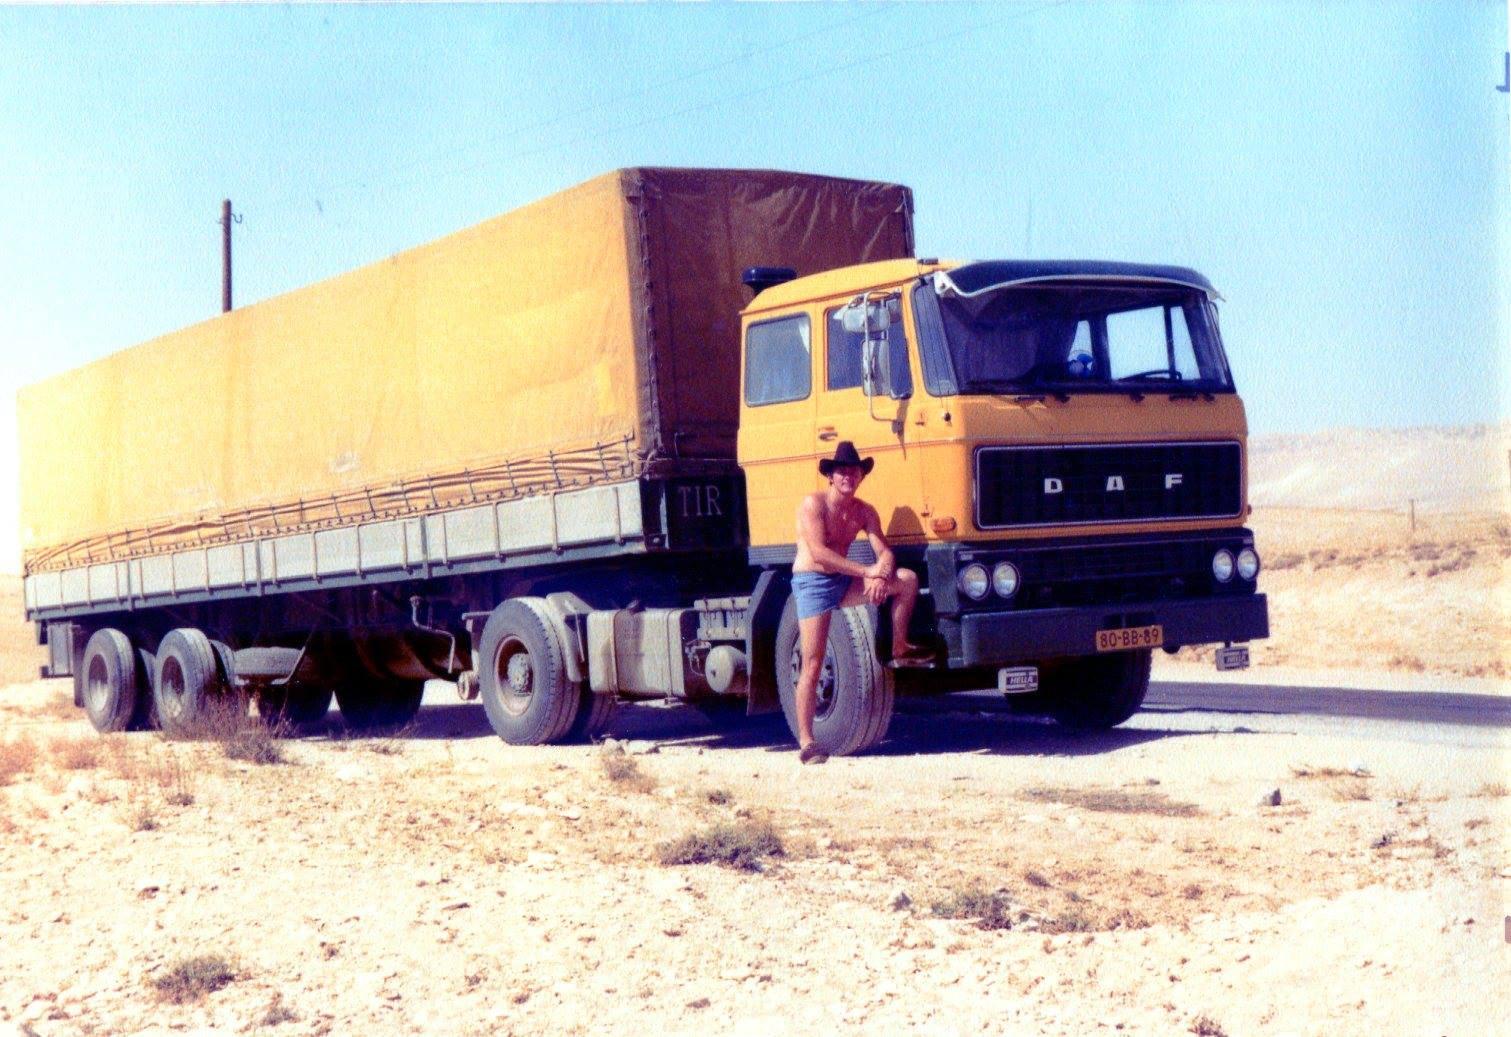 Hans-Anthonise-midden-oosten-transport-10